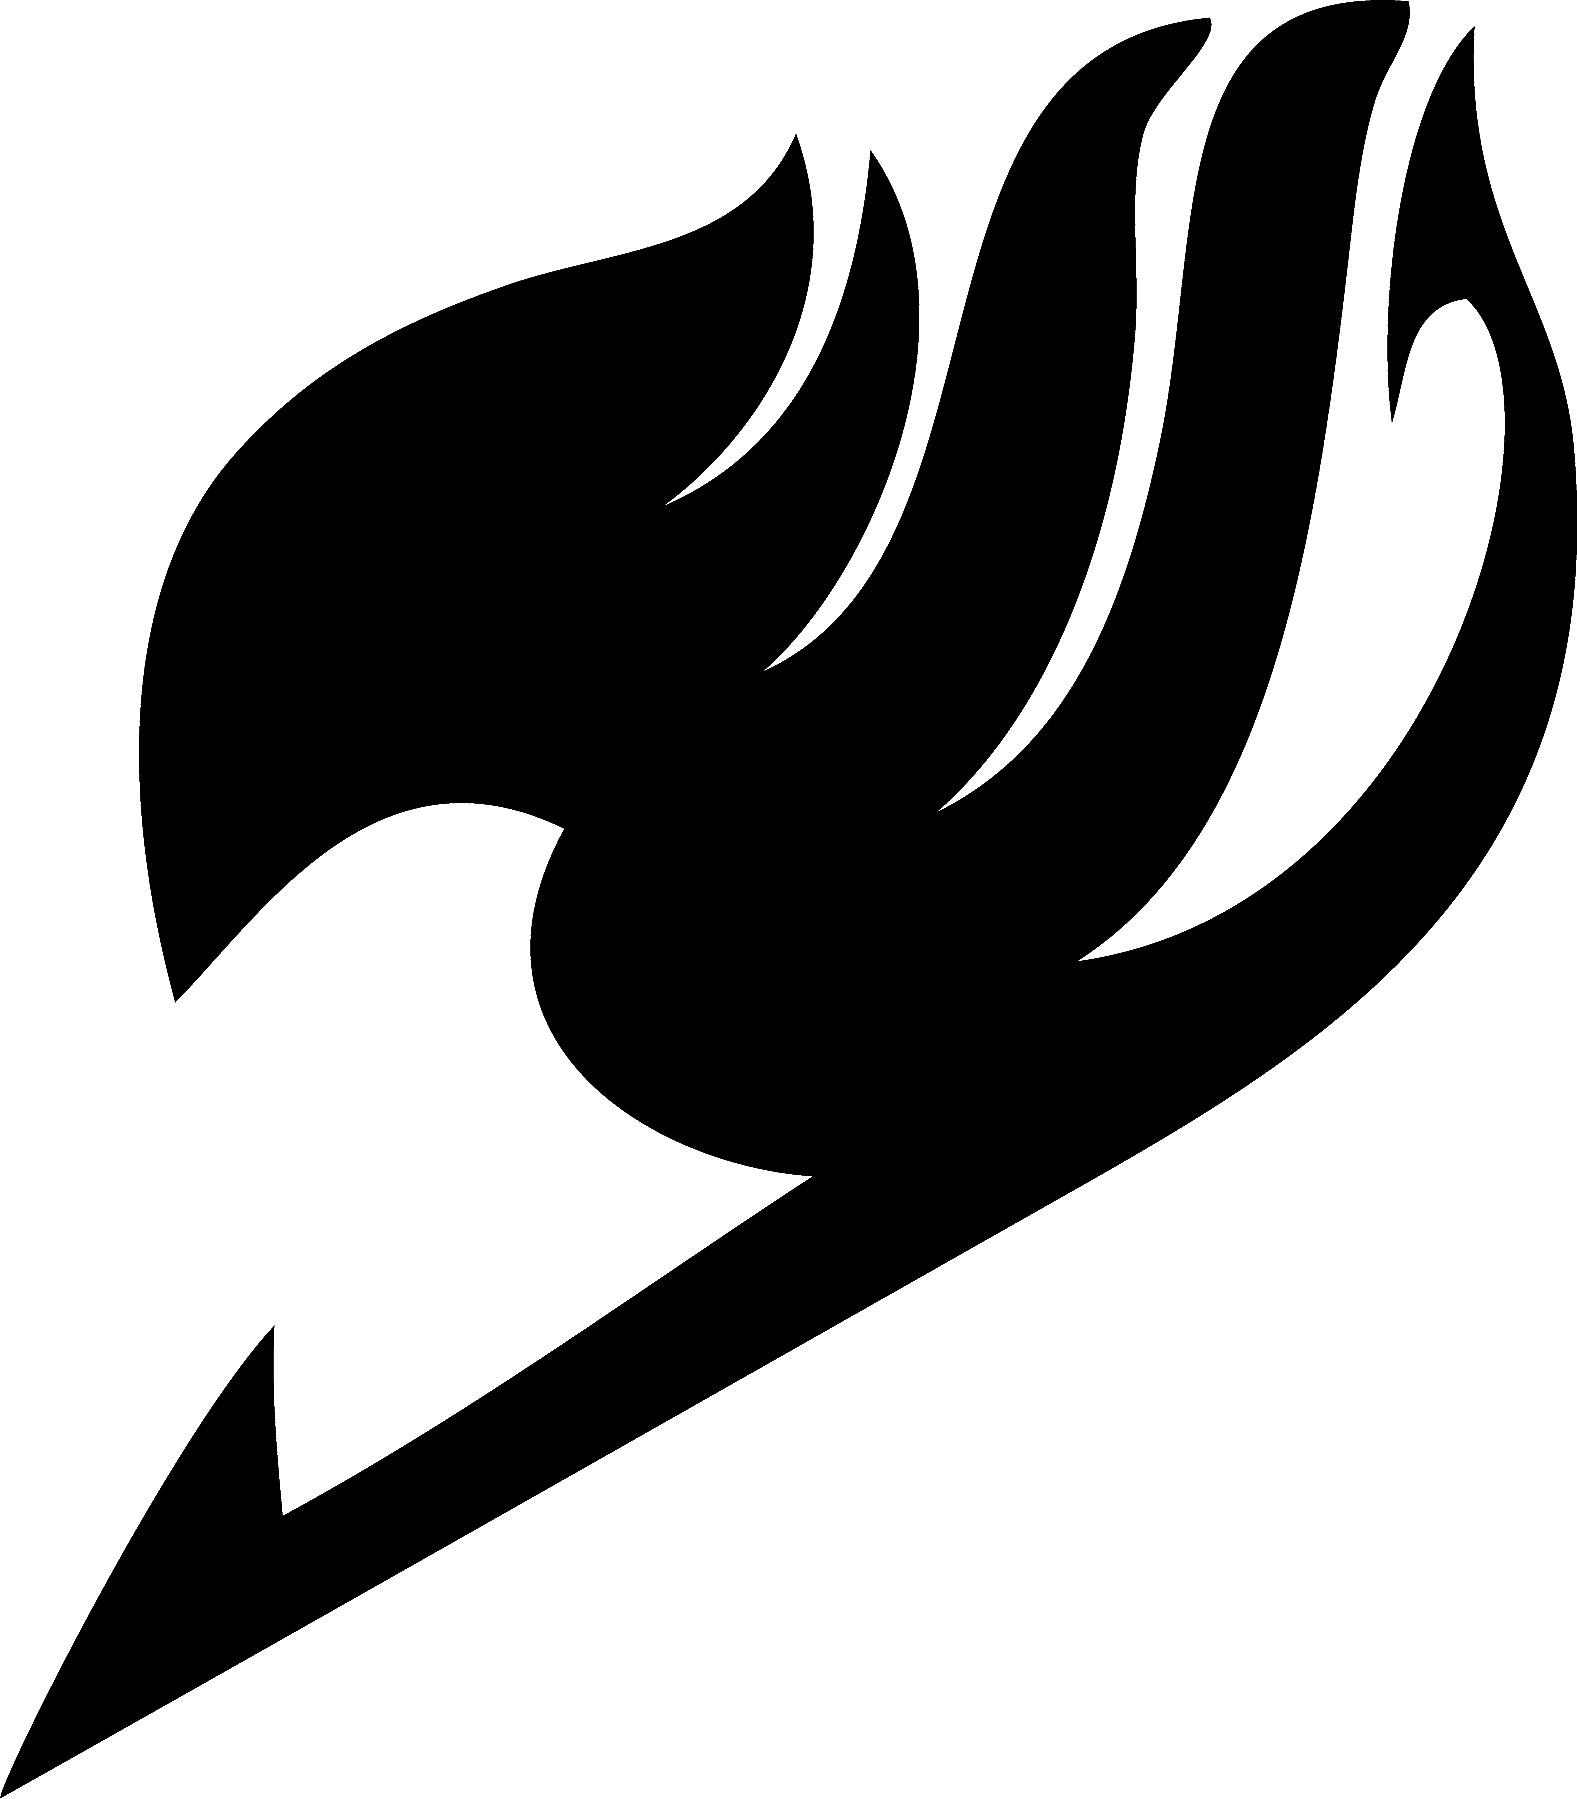 File:Fairy tail logo jpg - Wikimedia Commons